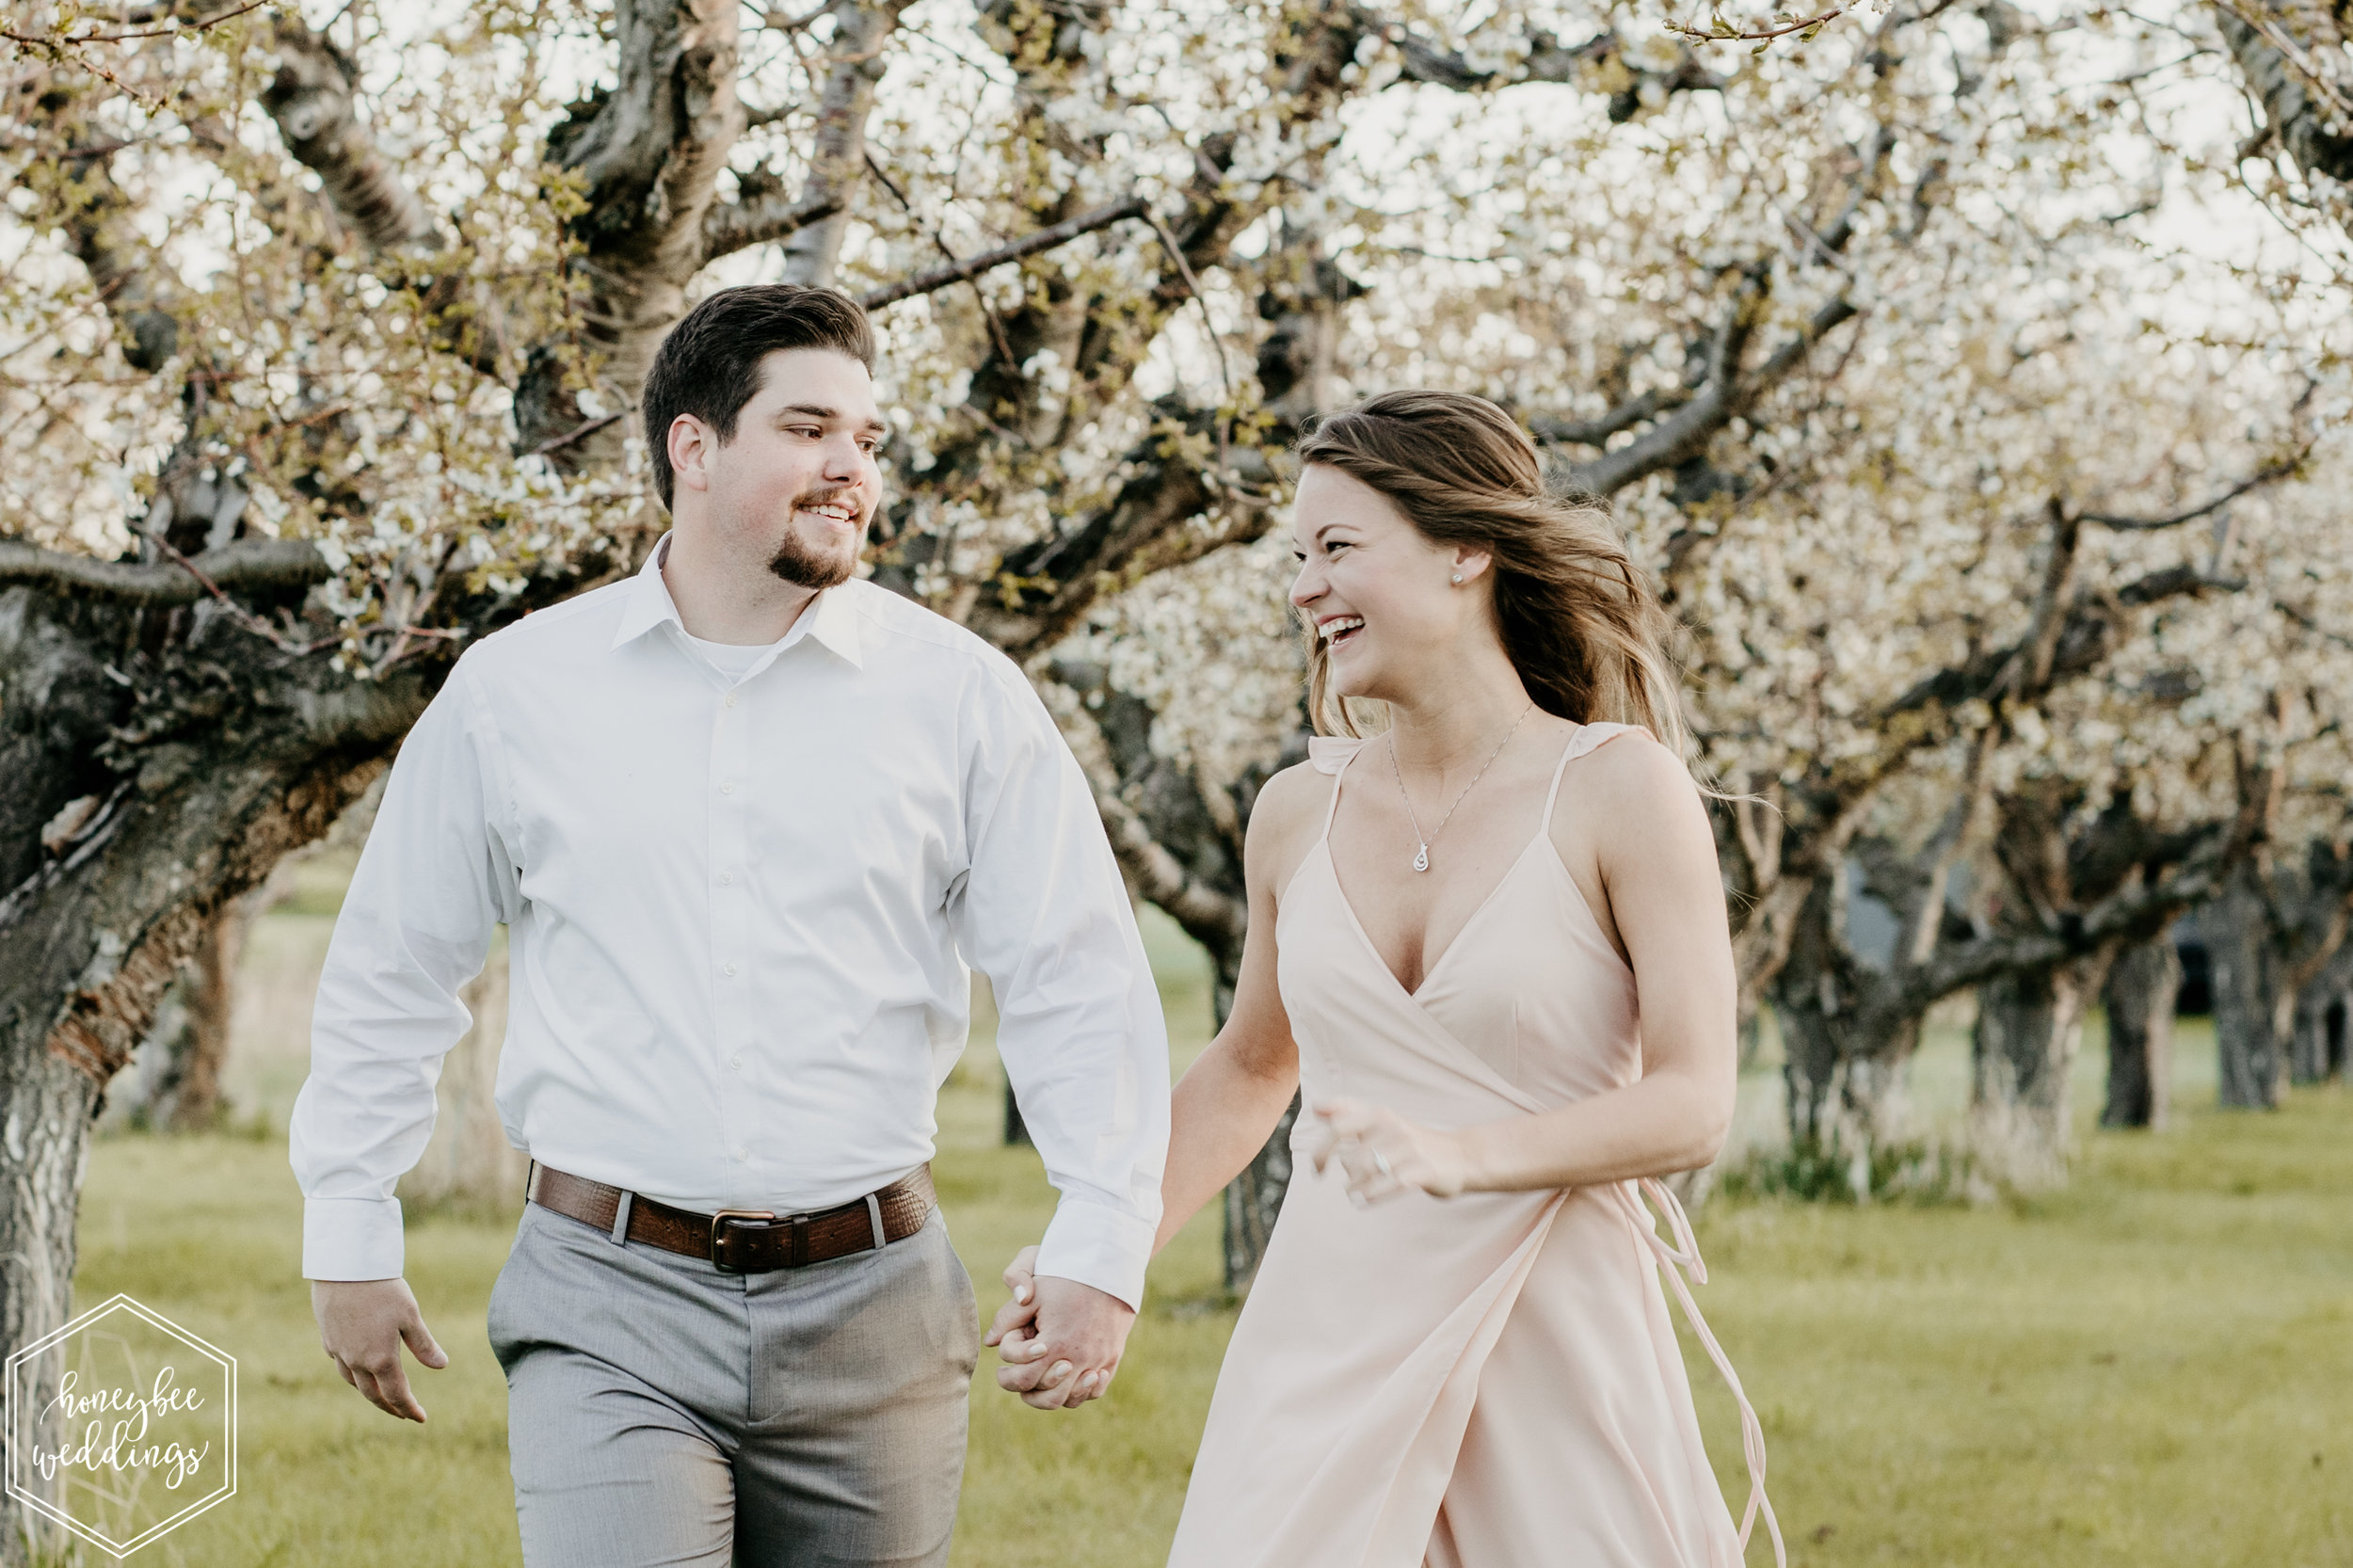 027Montana Wedding Photographer_Cherry Blossom Engagement Session_Ashlin & Luke_Honeybee Weddings_May 11, 2019-110.jpg